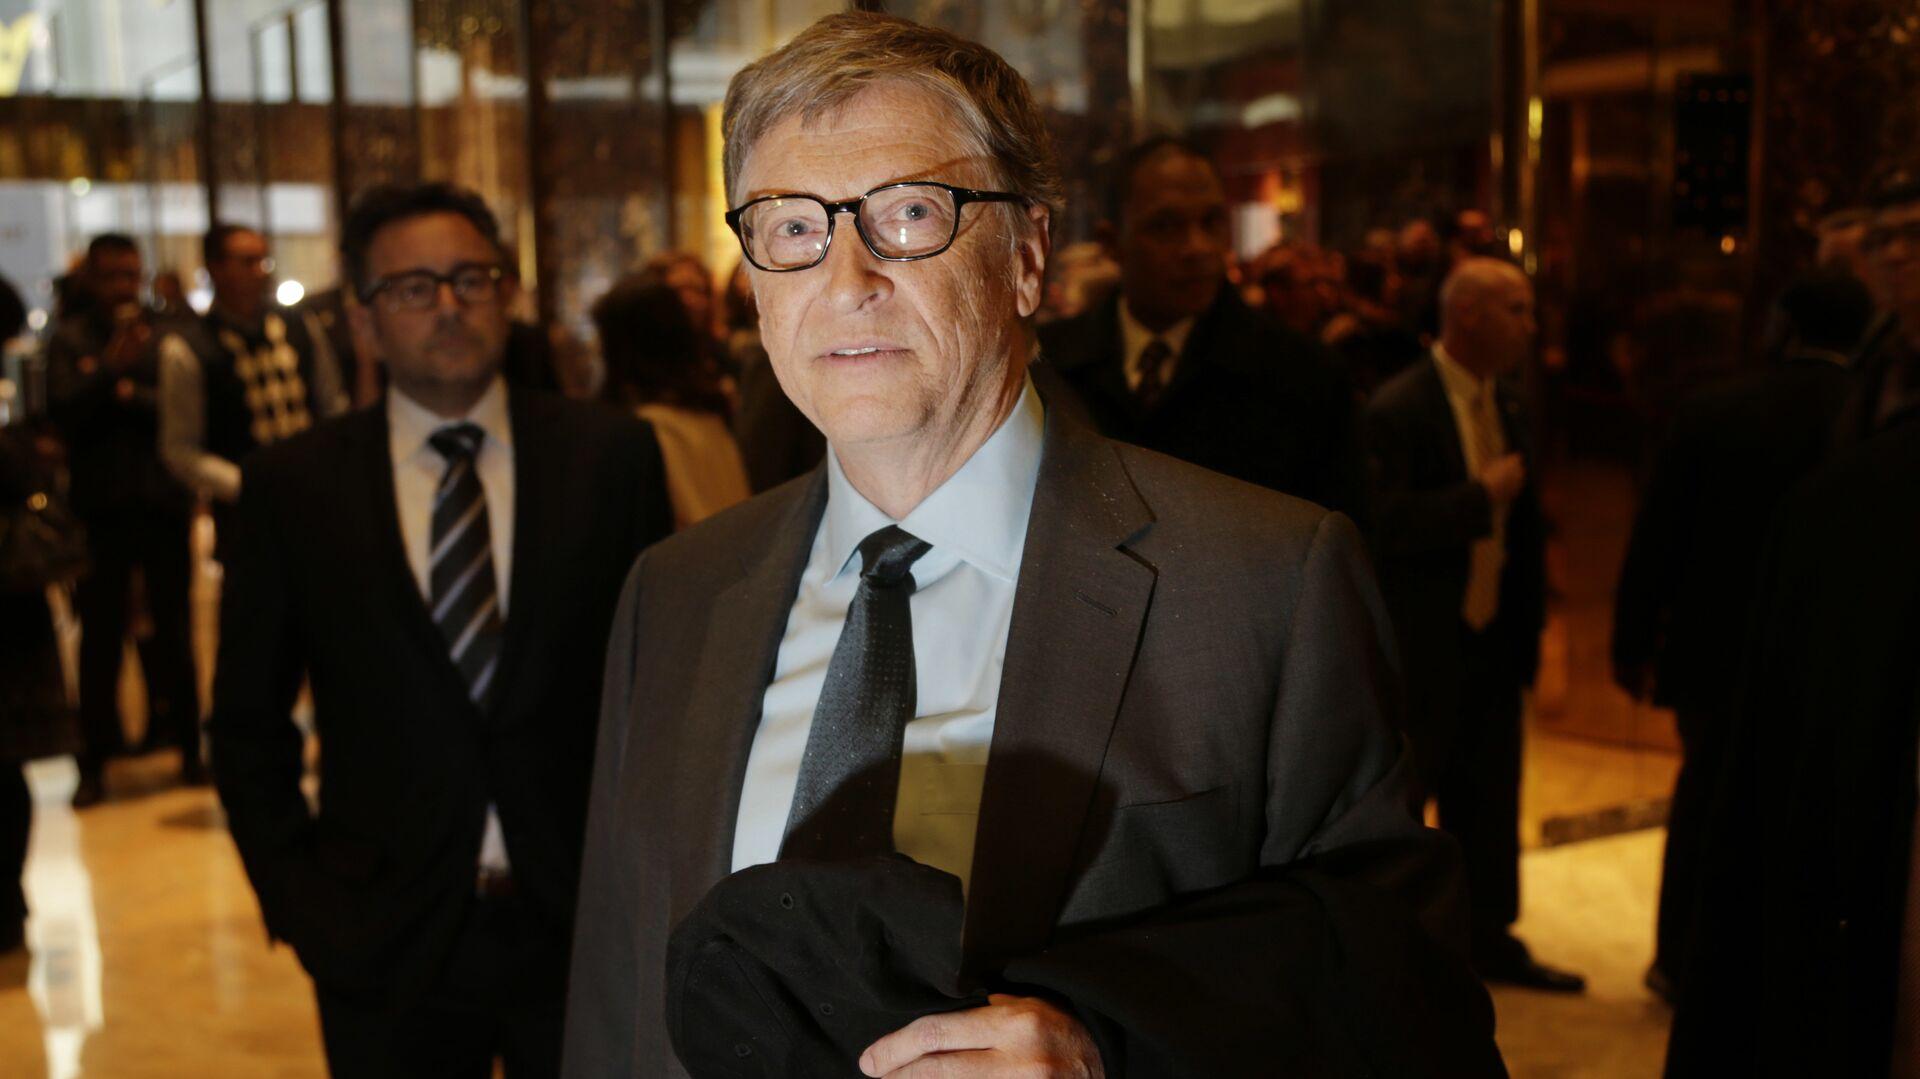 Bill Gates talks to reporters in the lobby of Trump Tower in New York, Tuesday, Dec. 13, 2016 - Sputnik Mundo, 1920, 17.05.2021